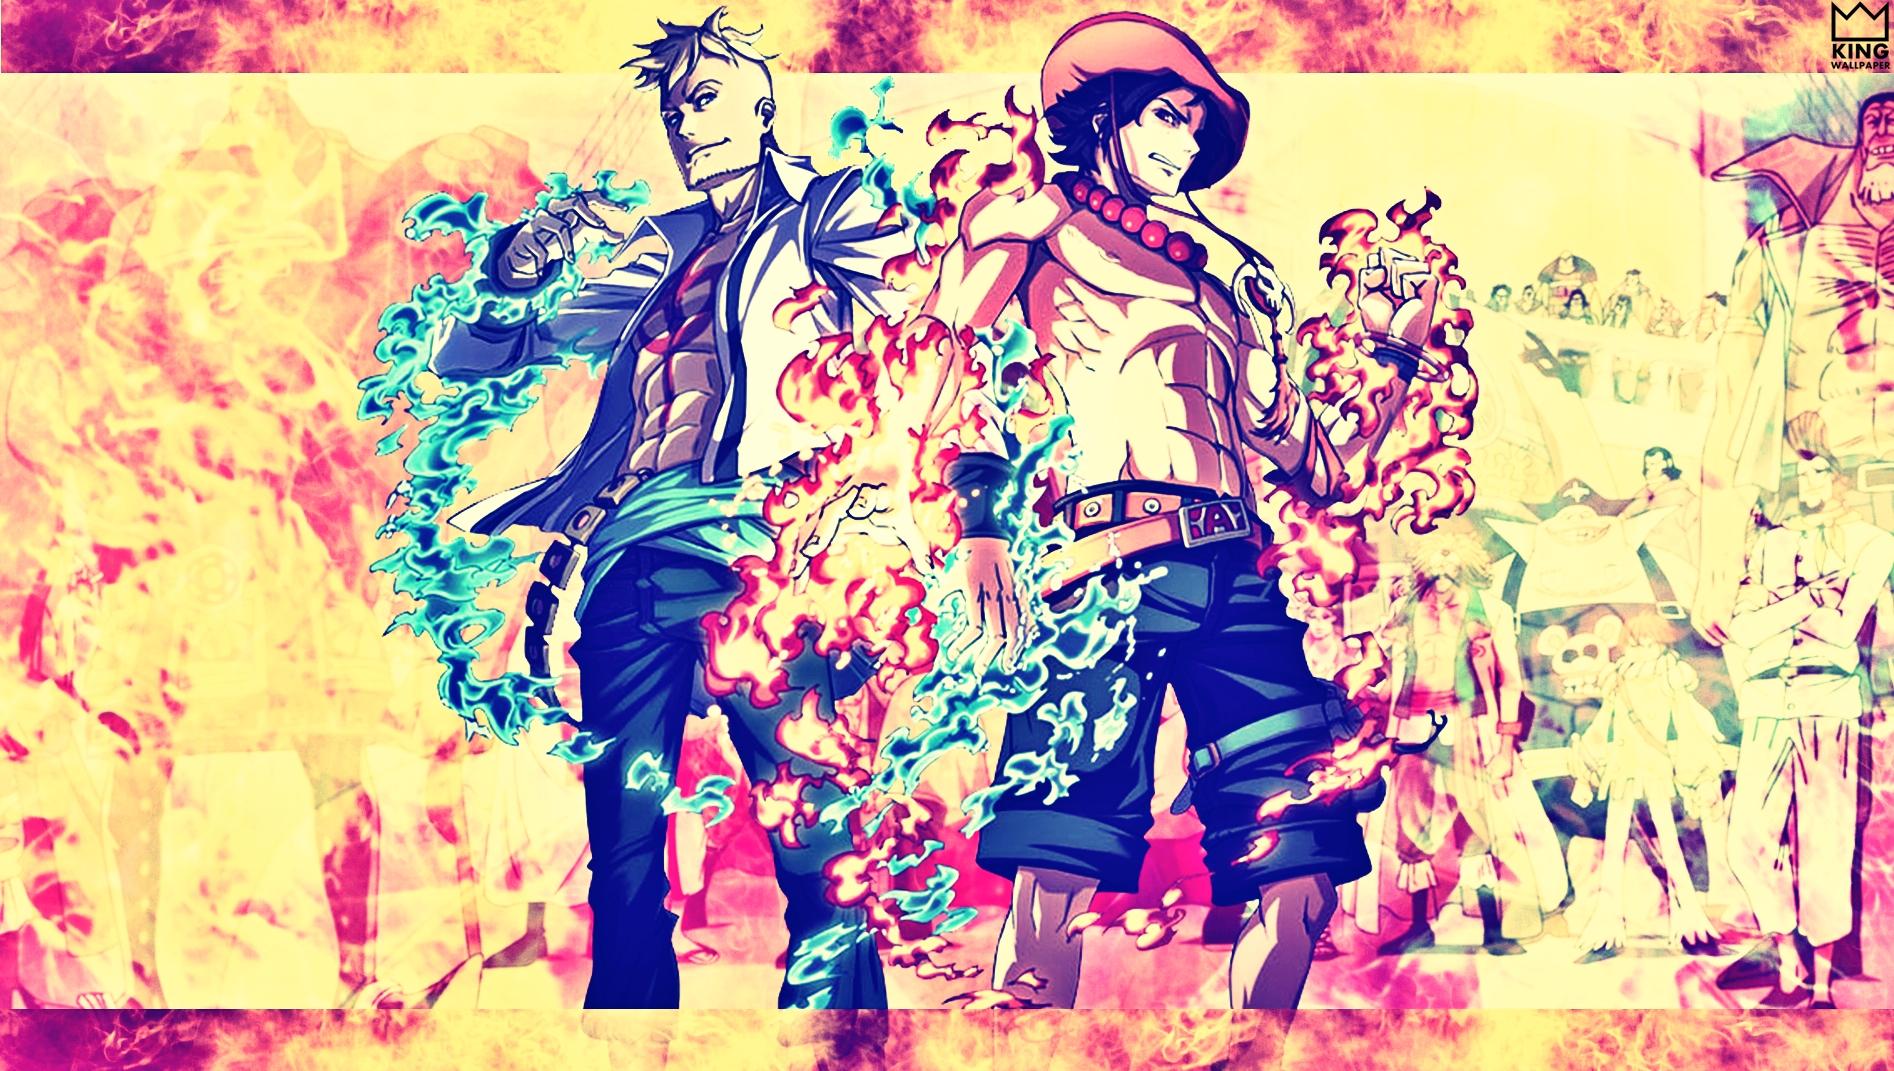 One Piece Ace High Resolution Wallpaper | One Piece | Pinterest ...